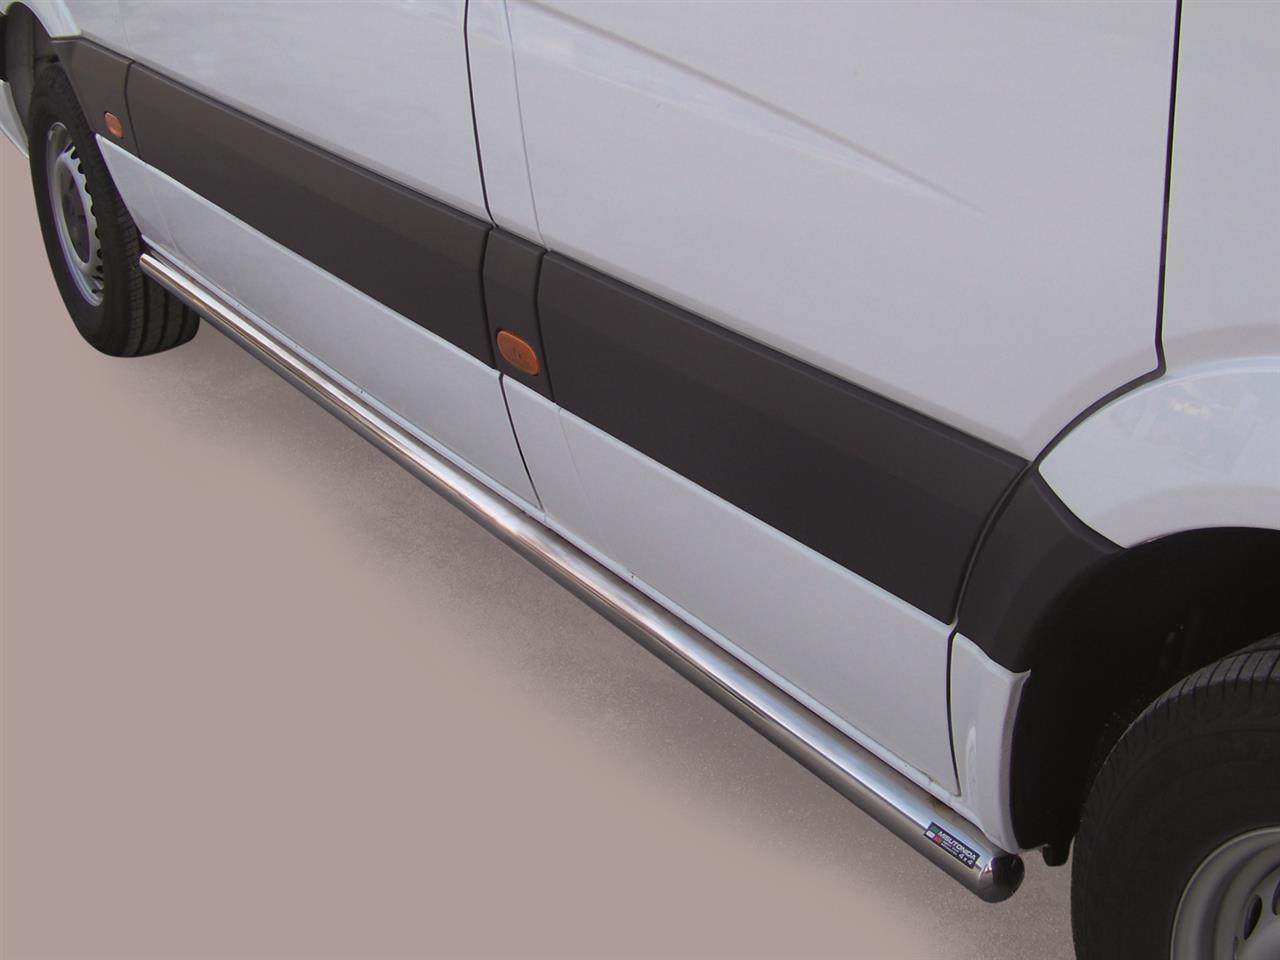 tps304ix tube bas de caisse inox 63 volkswagen crafter l2 2011 volkswagen crafter. Black Bedroom Furniture Sets. Home Design Ideas